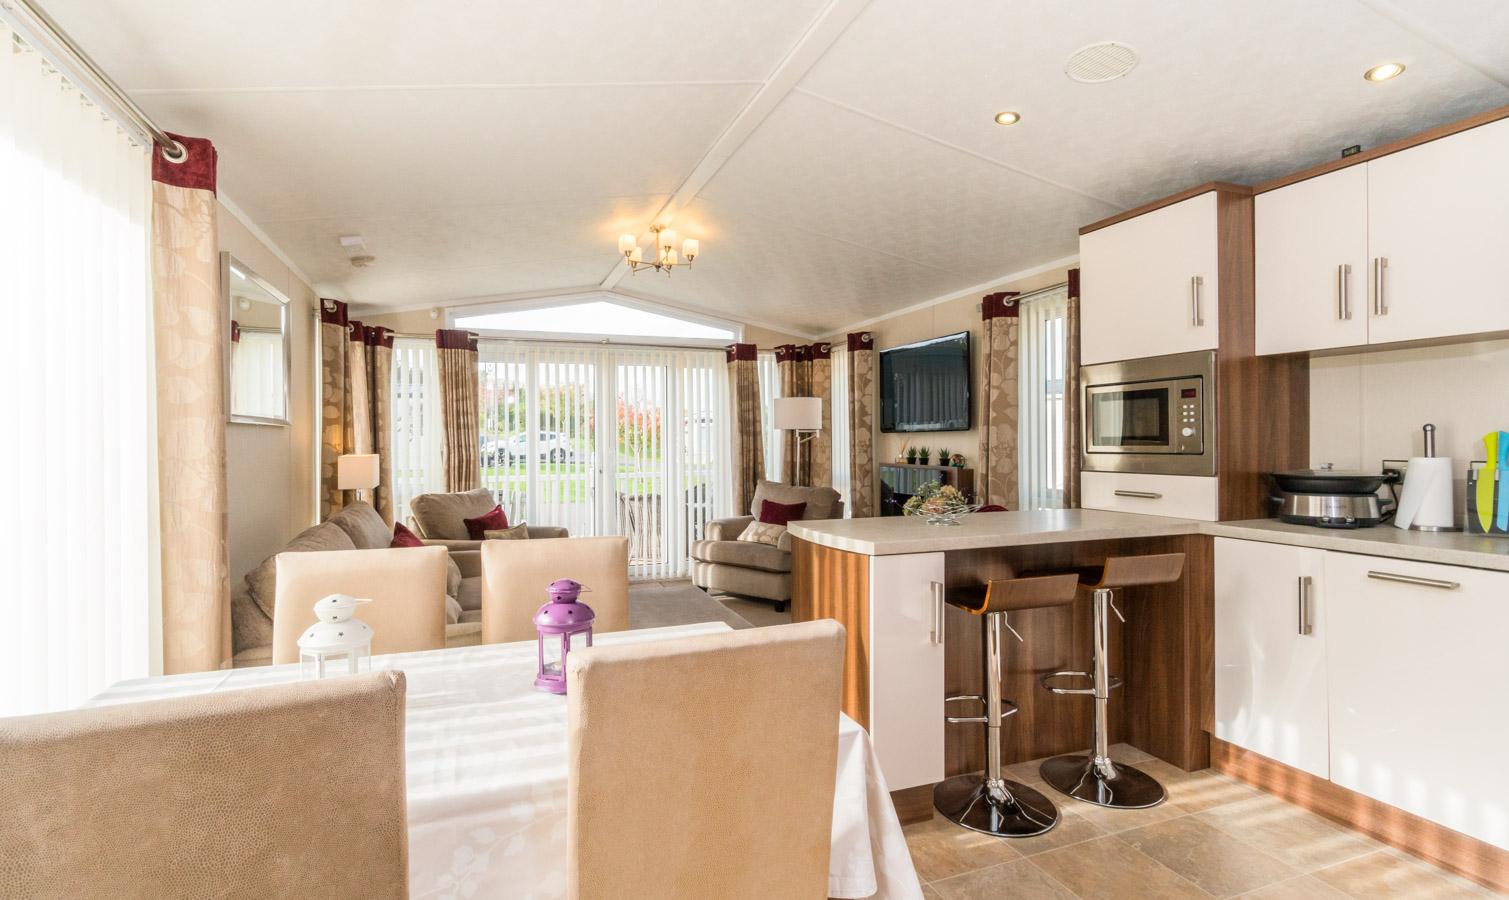 Neil-Bigwood-Monkton-Wyld-Holiday-Homes-48